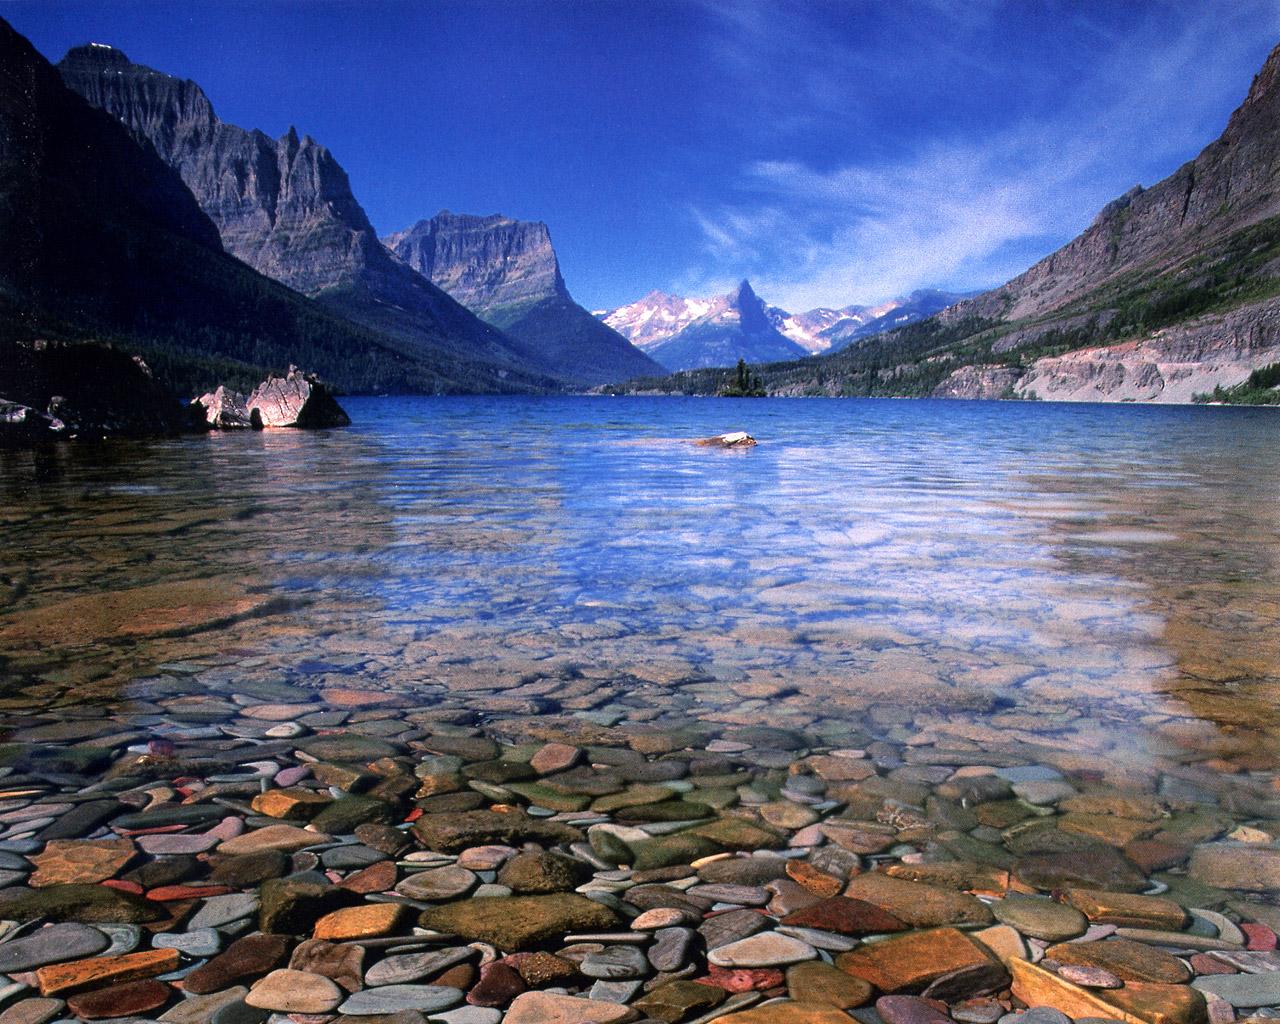 glacier national park photo - photo #10